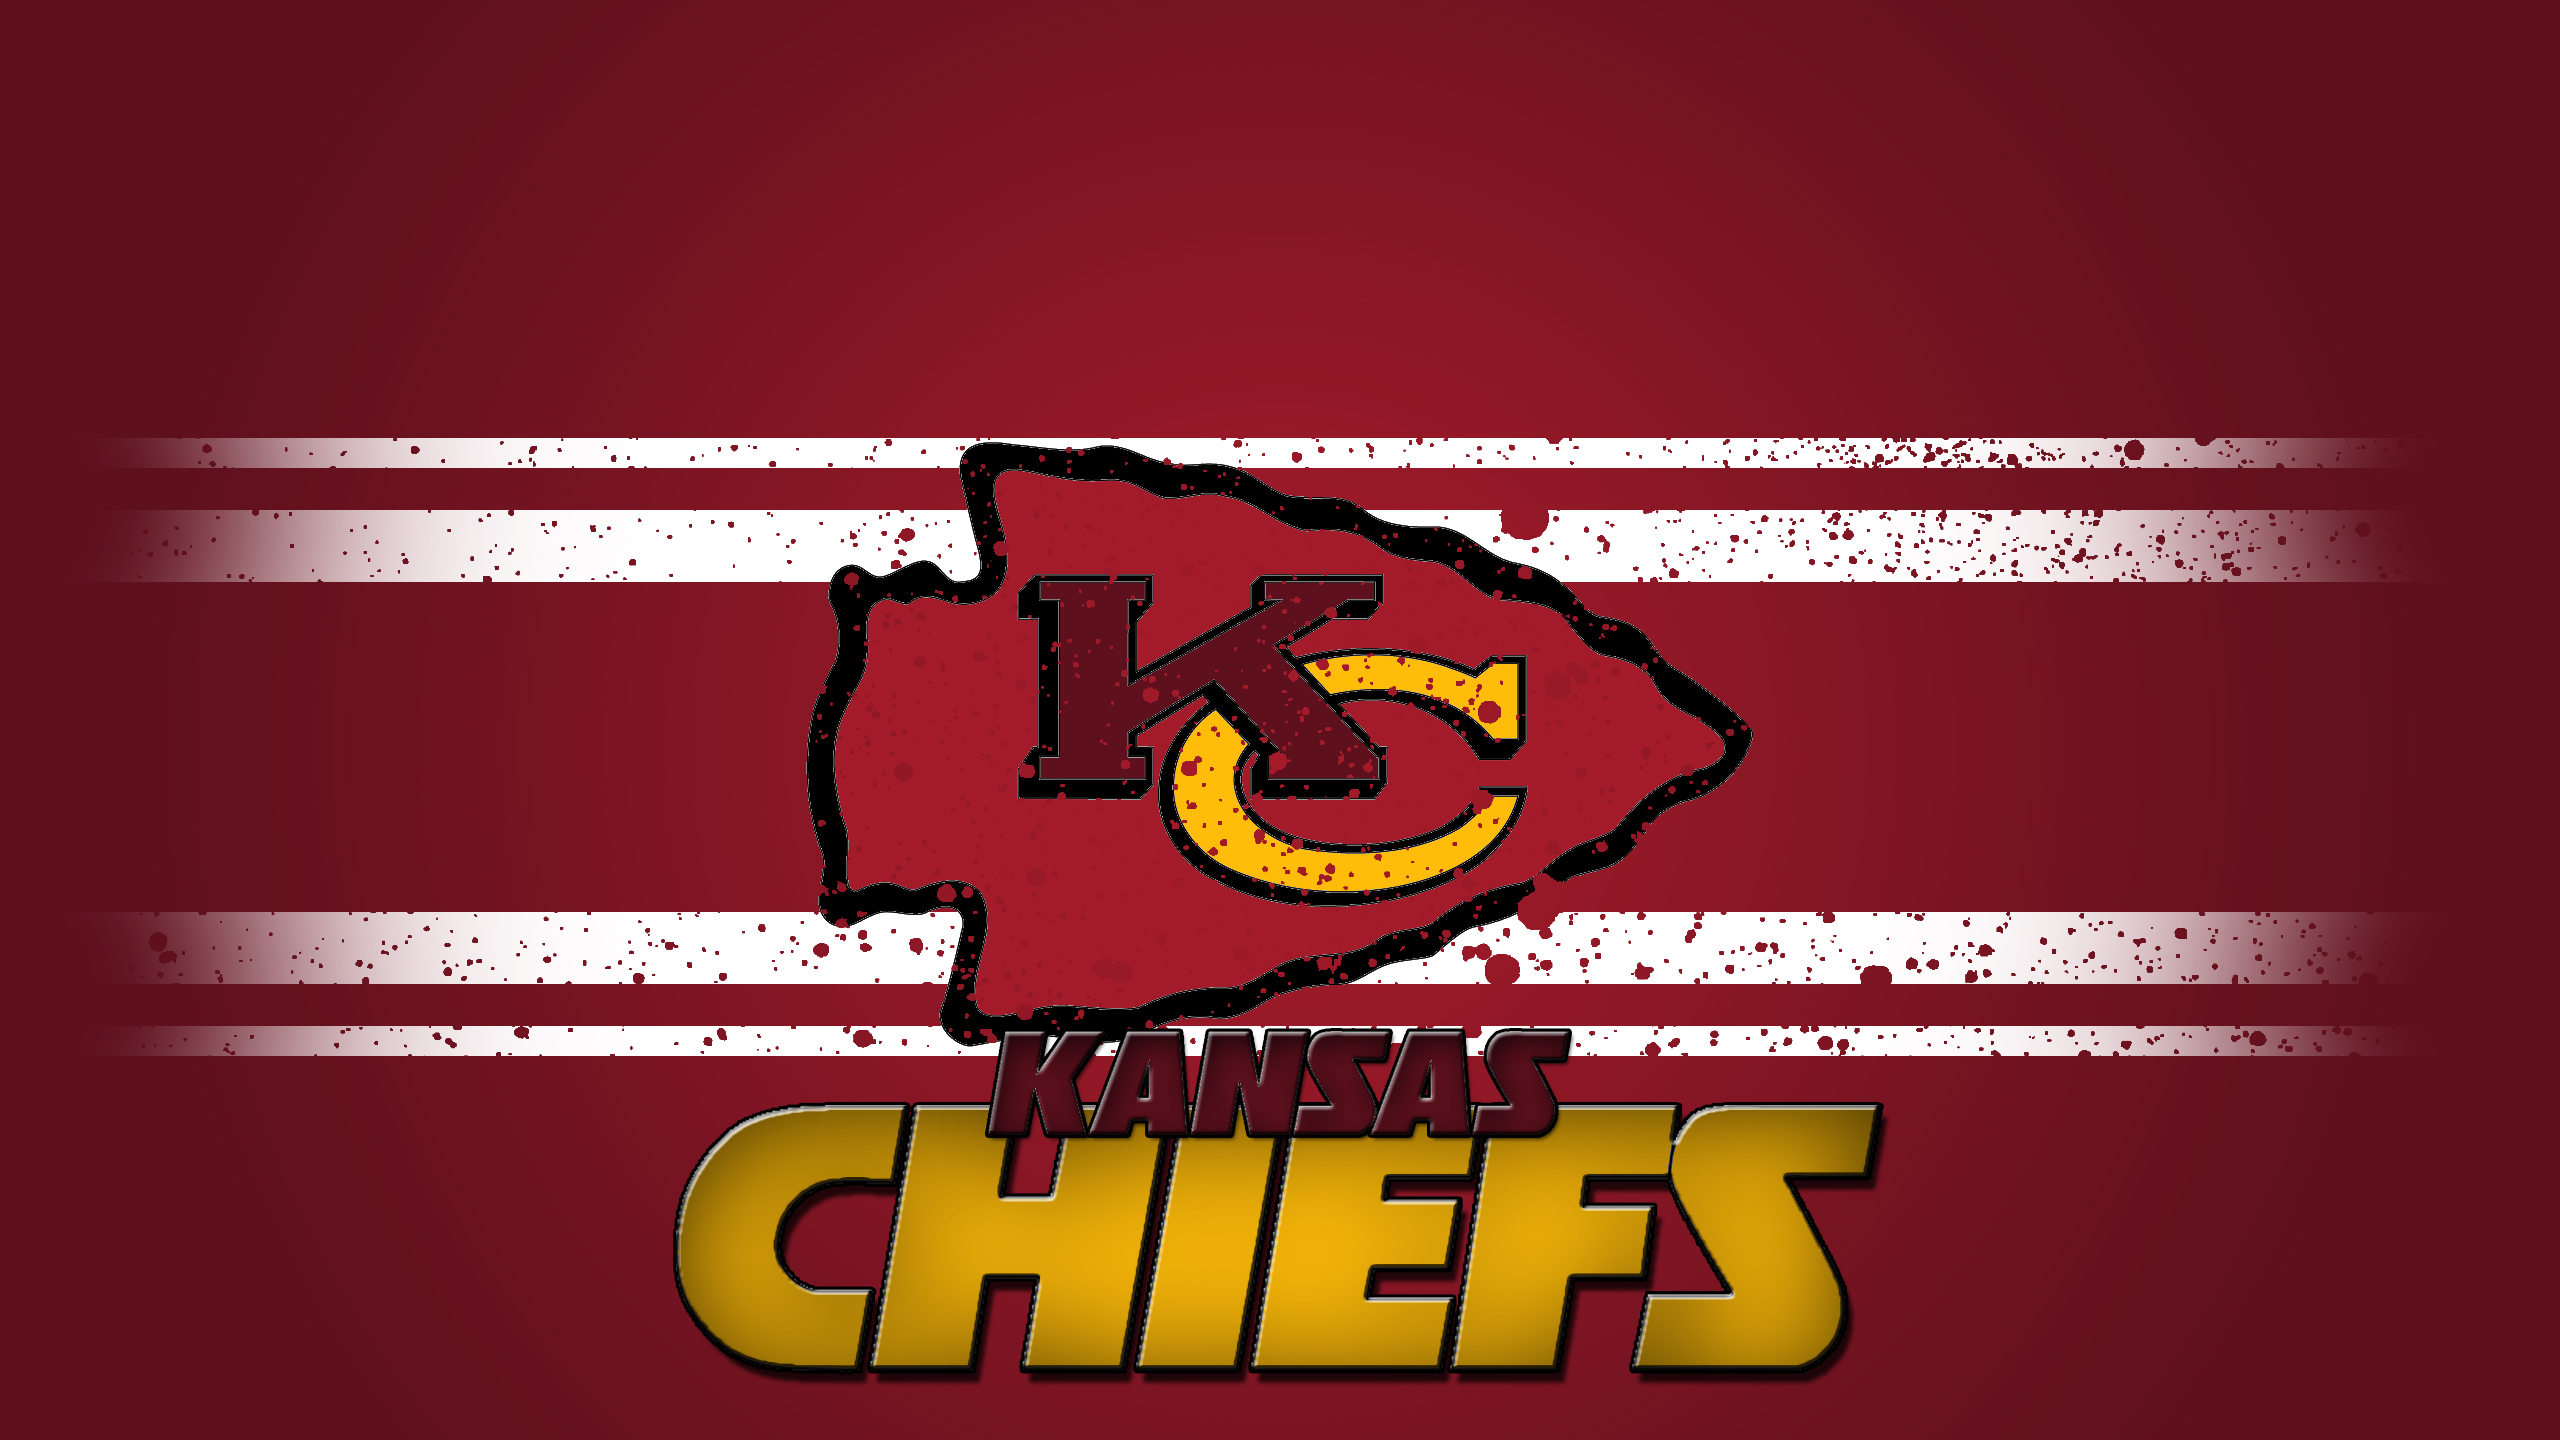 Kansas City Chiefs By Beaware8 On Deviantart